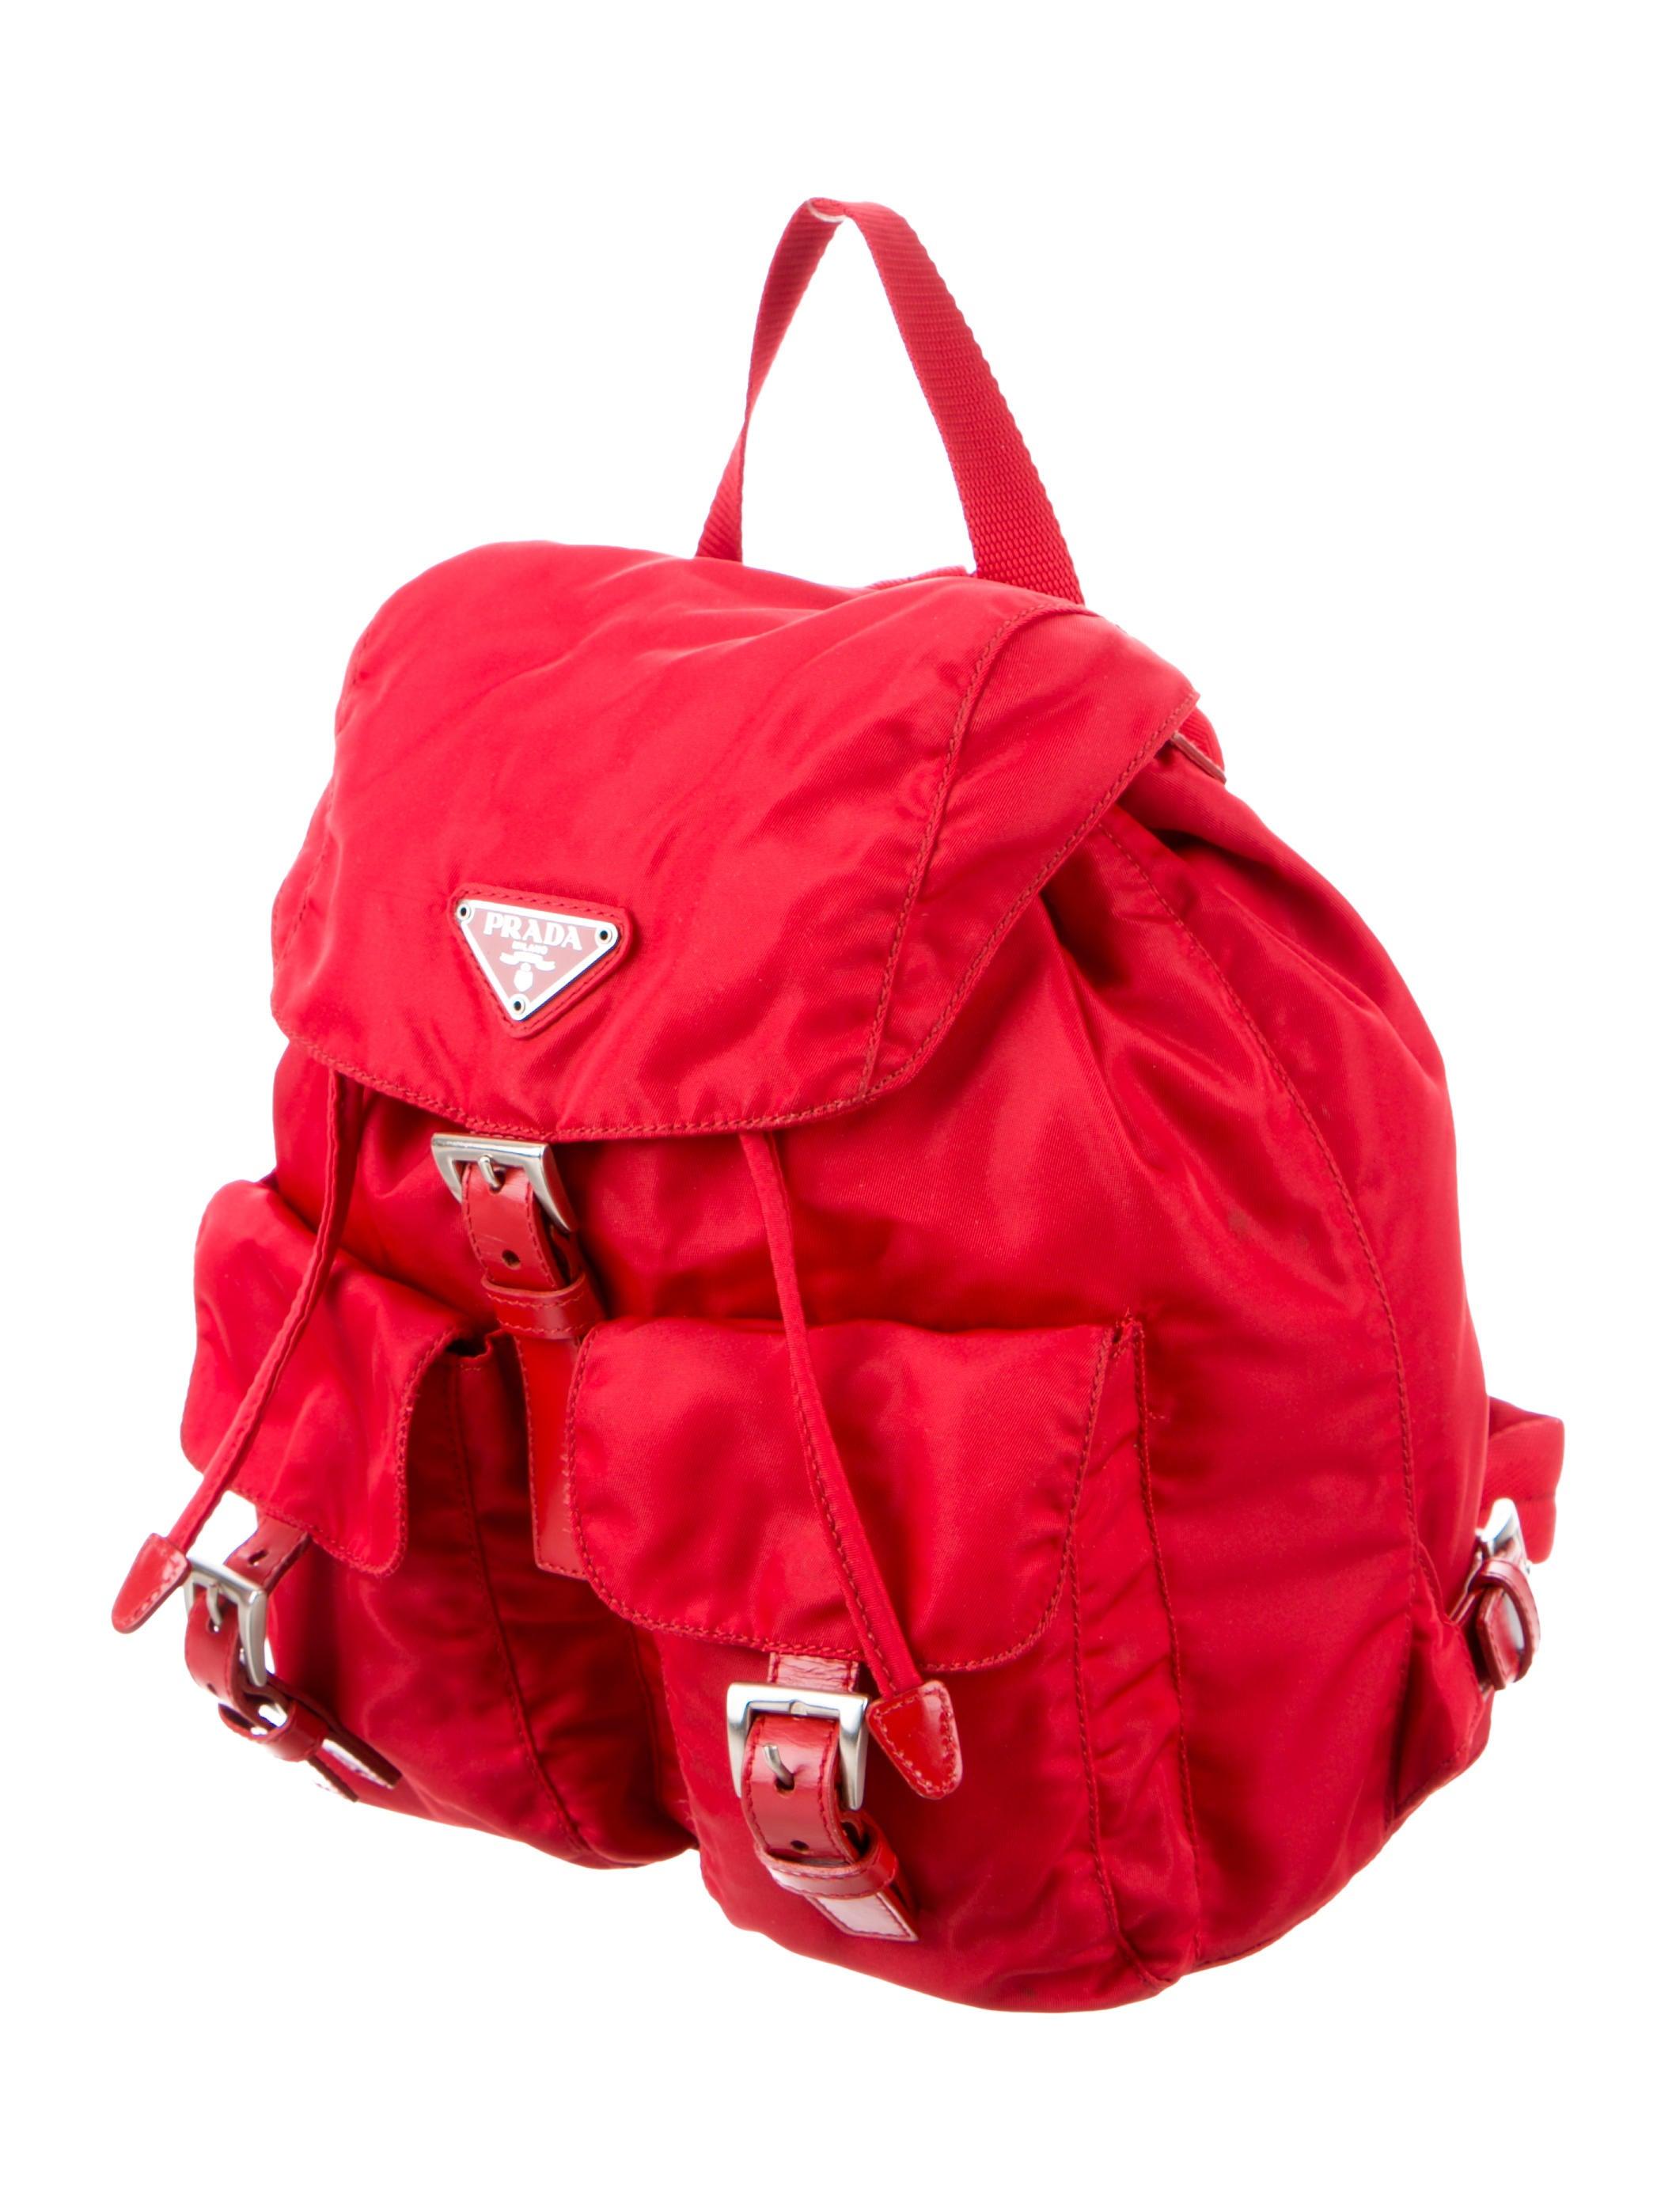 fb25b0660275 Prada Leather-Trimmed Vela Backpack - Handbags - PRA219225